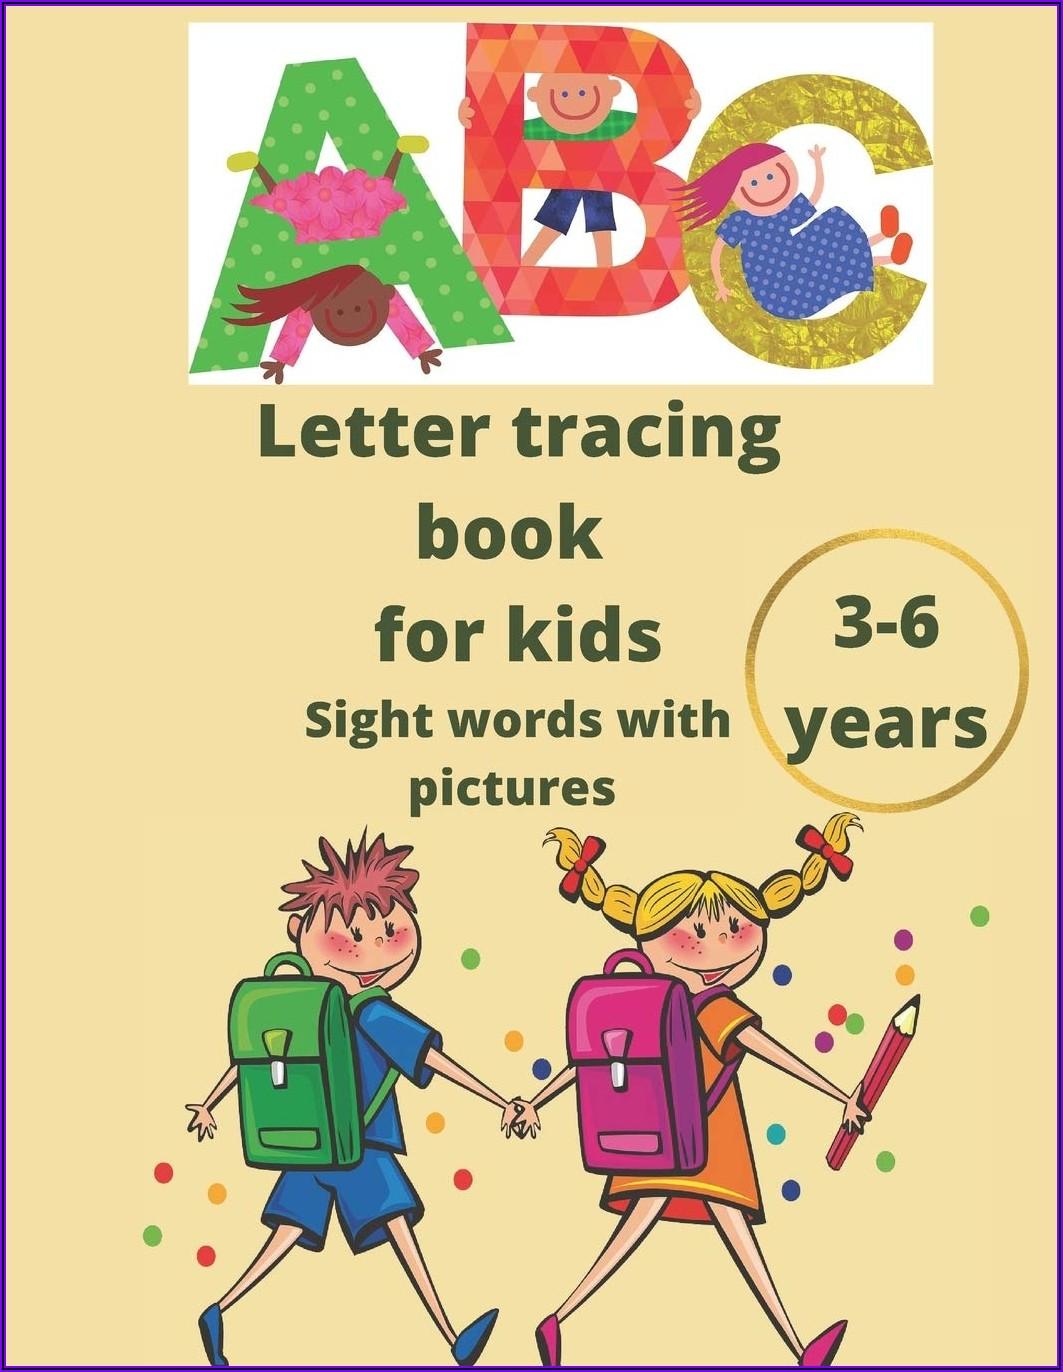 6 Letter Words For Kids